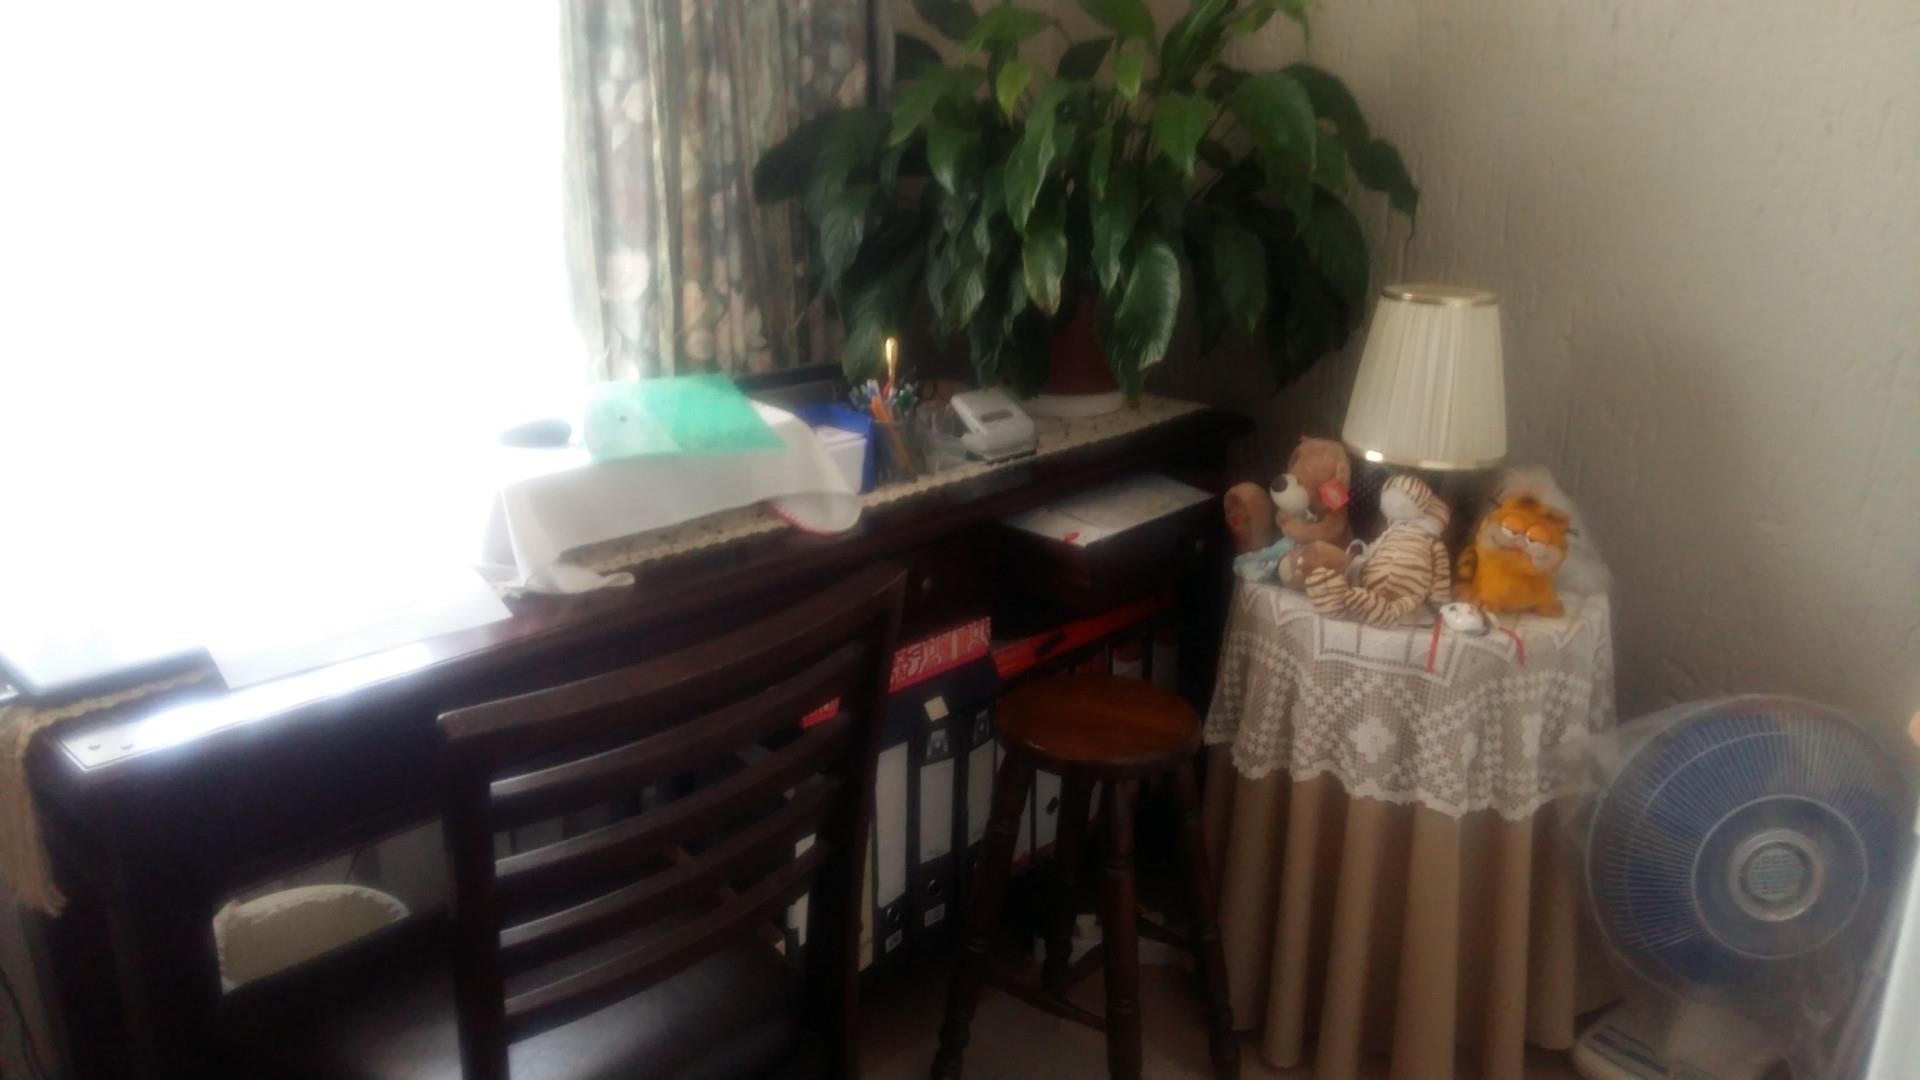 3 Bedroom Townhouse For Sale in Rewlatch